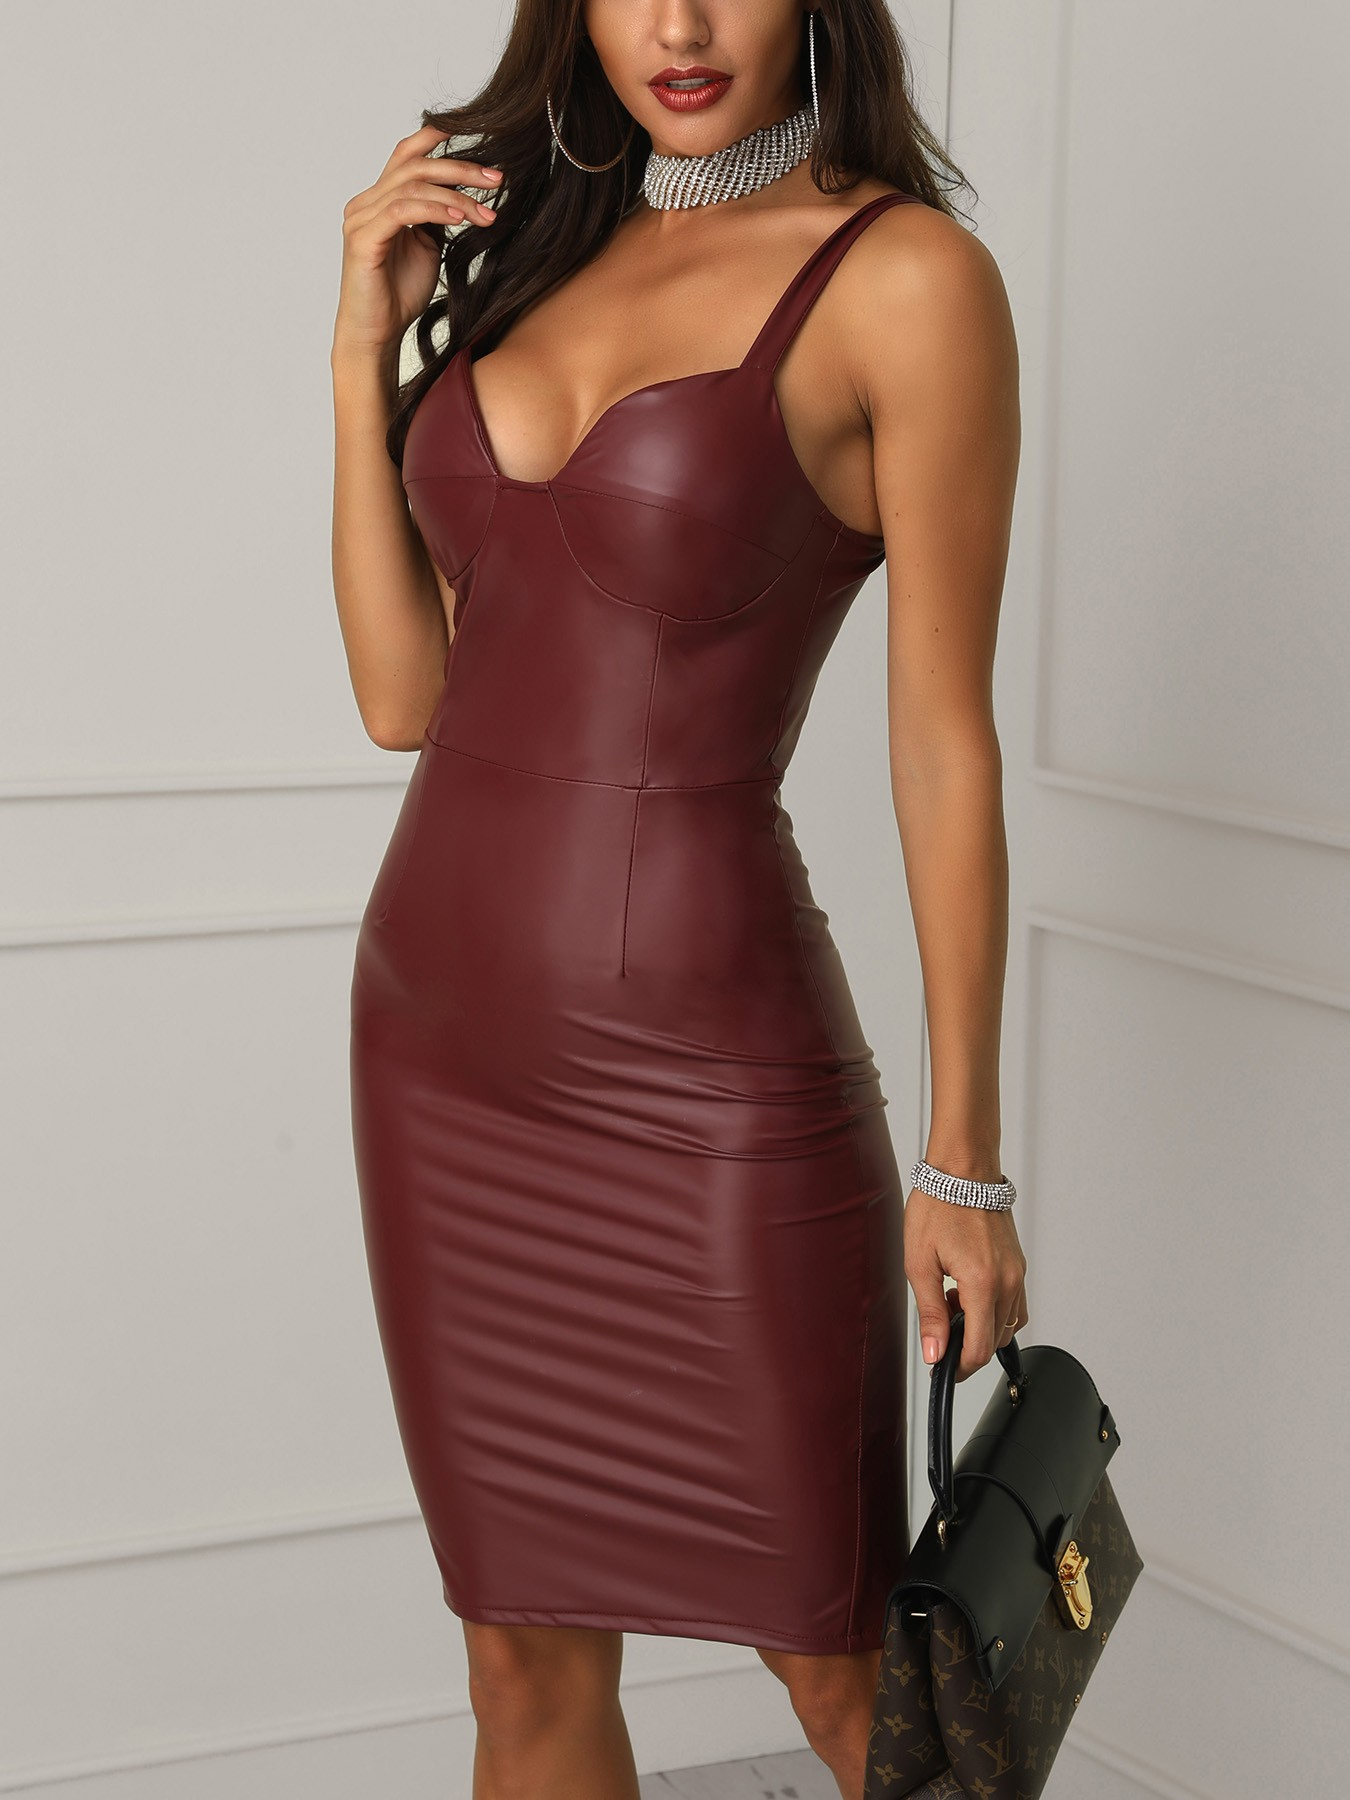 boutiquefeel / PU Slit Back Spaghetti Strap Bodycon Dress